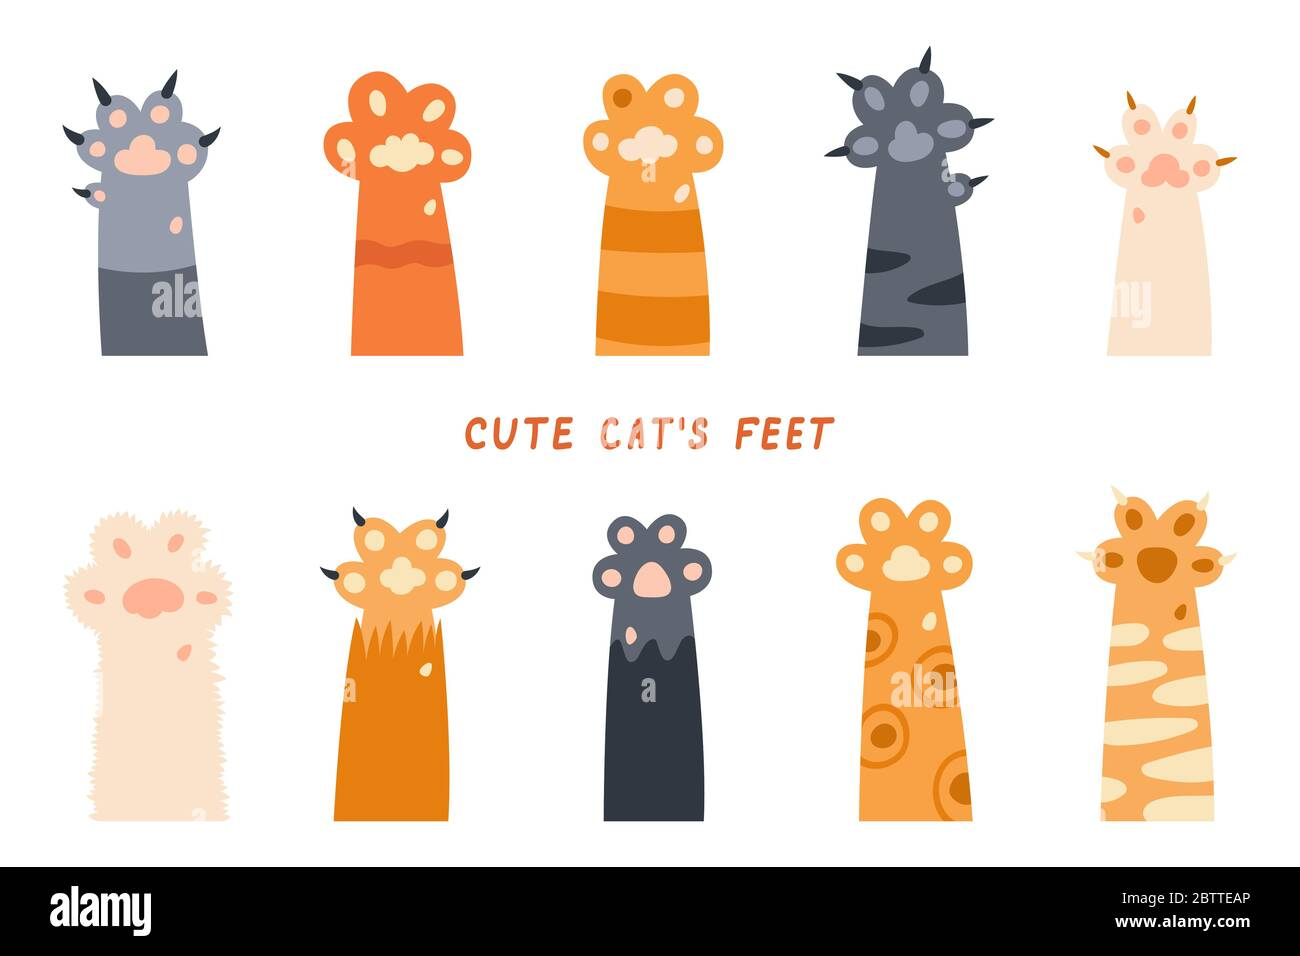 Cat Paws Legs Dog Paw Cat Background Kitten Flat Design Prints Cartoon Cute Cat Foot Wallpaper Vector Illustration Stock Vector Image Art Alamy